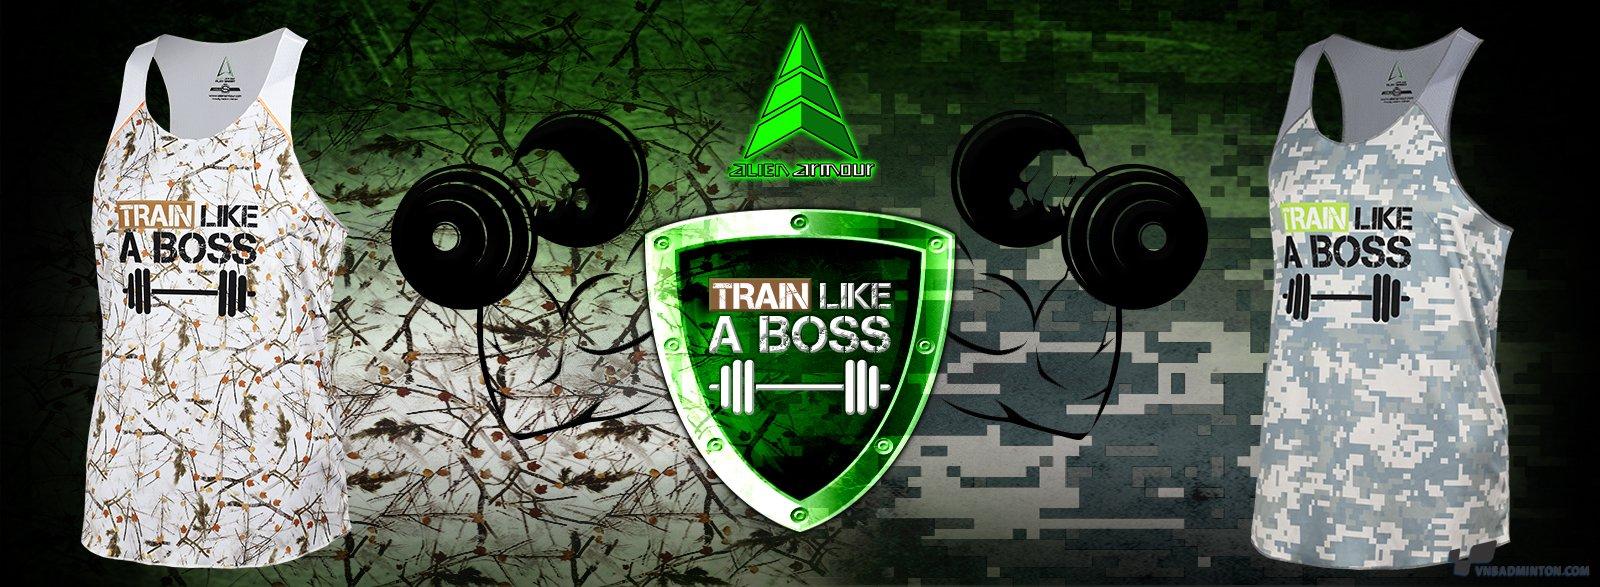 train like a boss.jpg